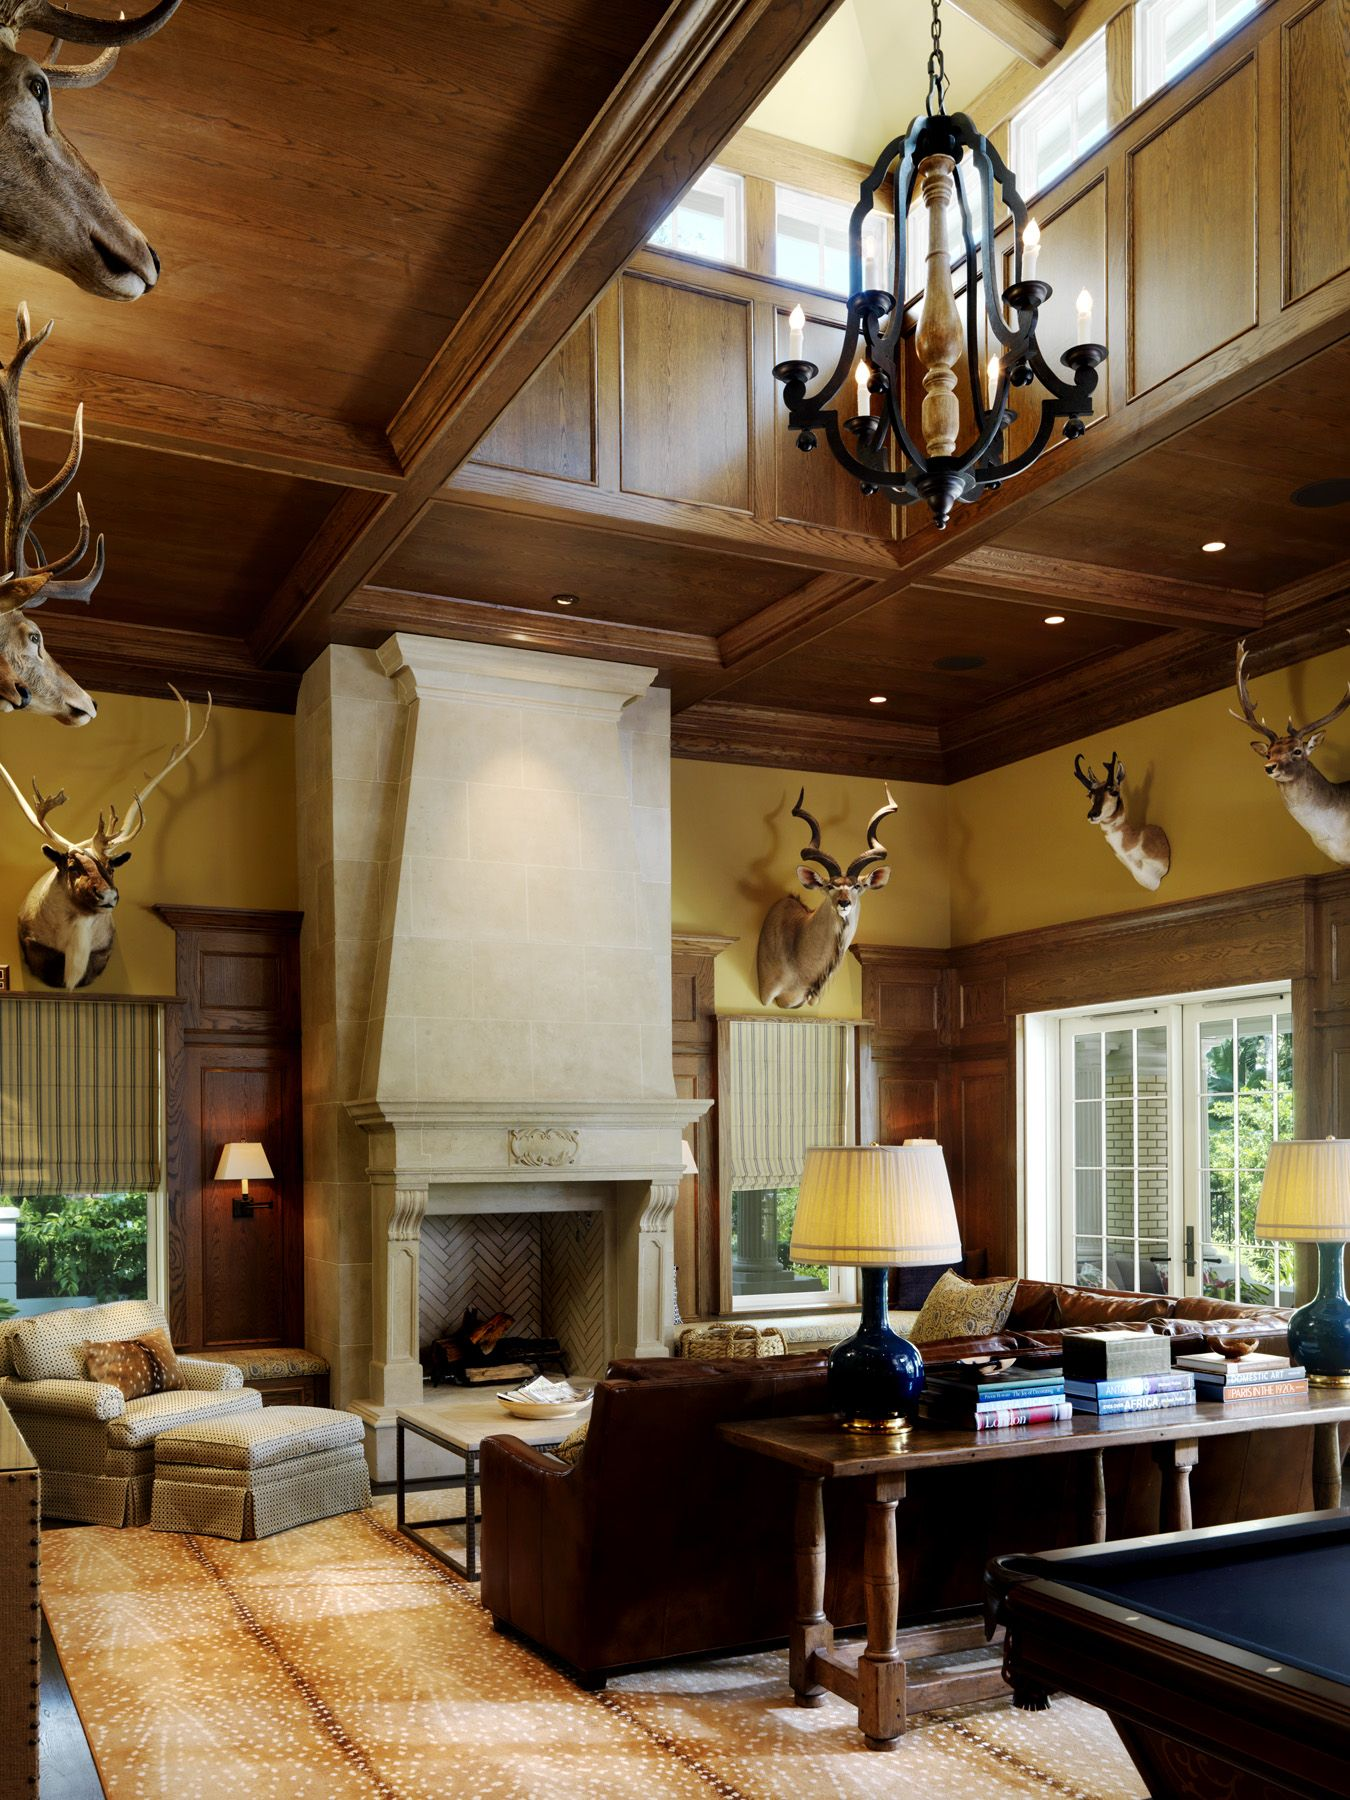 Home Interior Design Game Online: Historic Renovation, Hyde Park Residence, Interior, Game